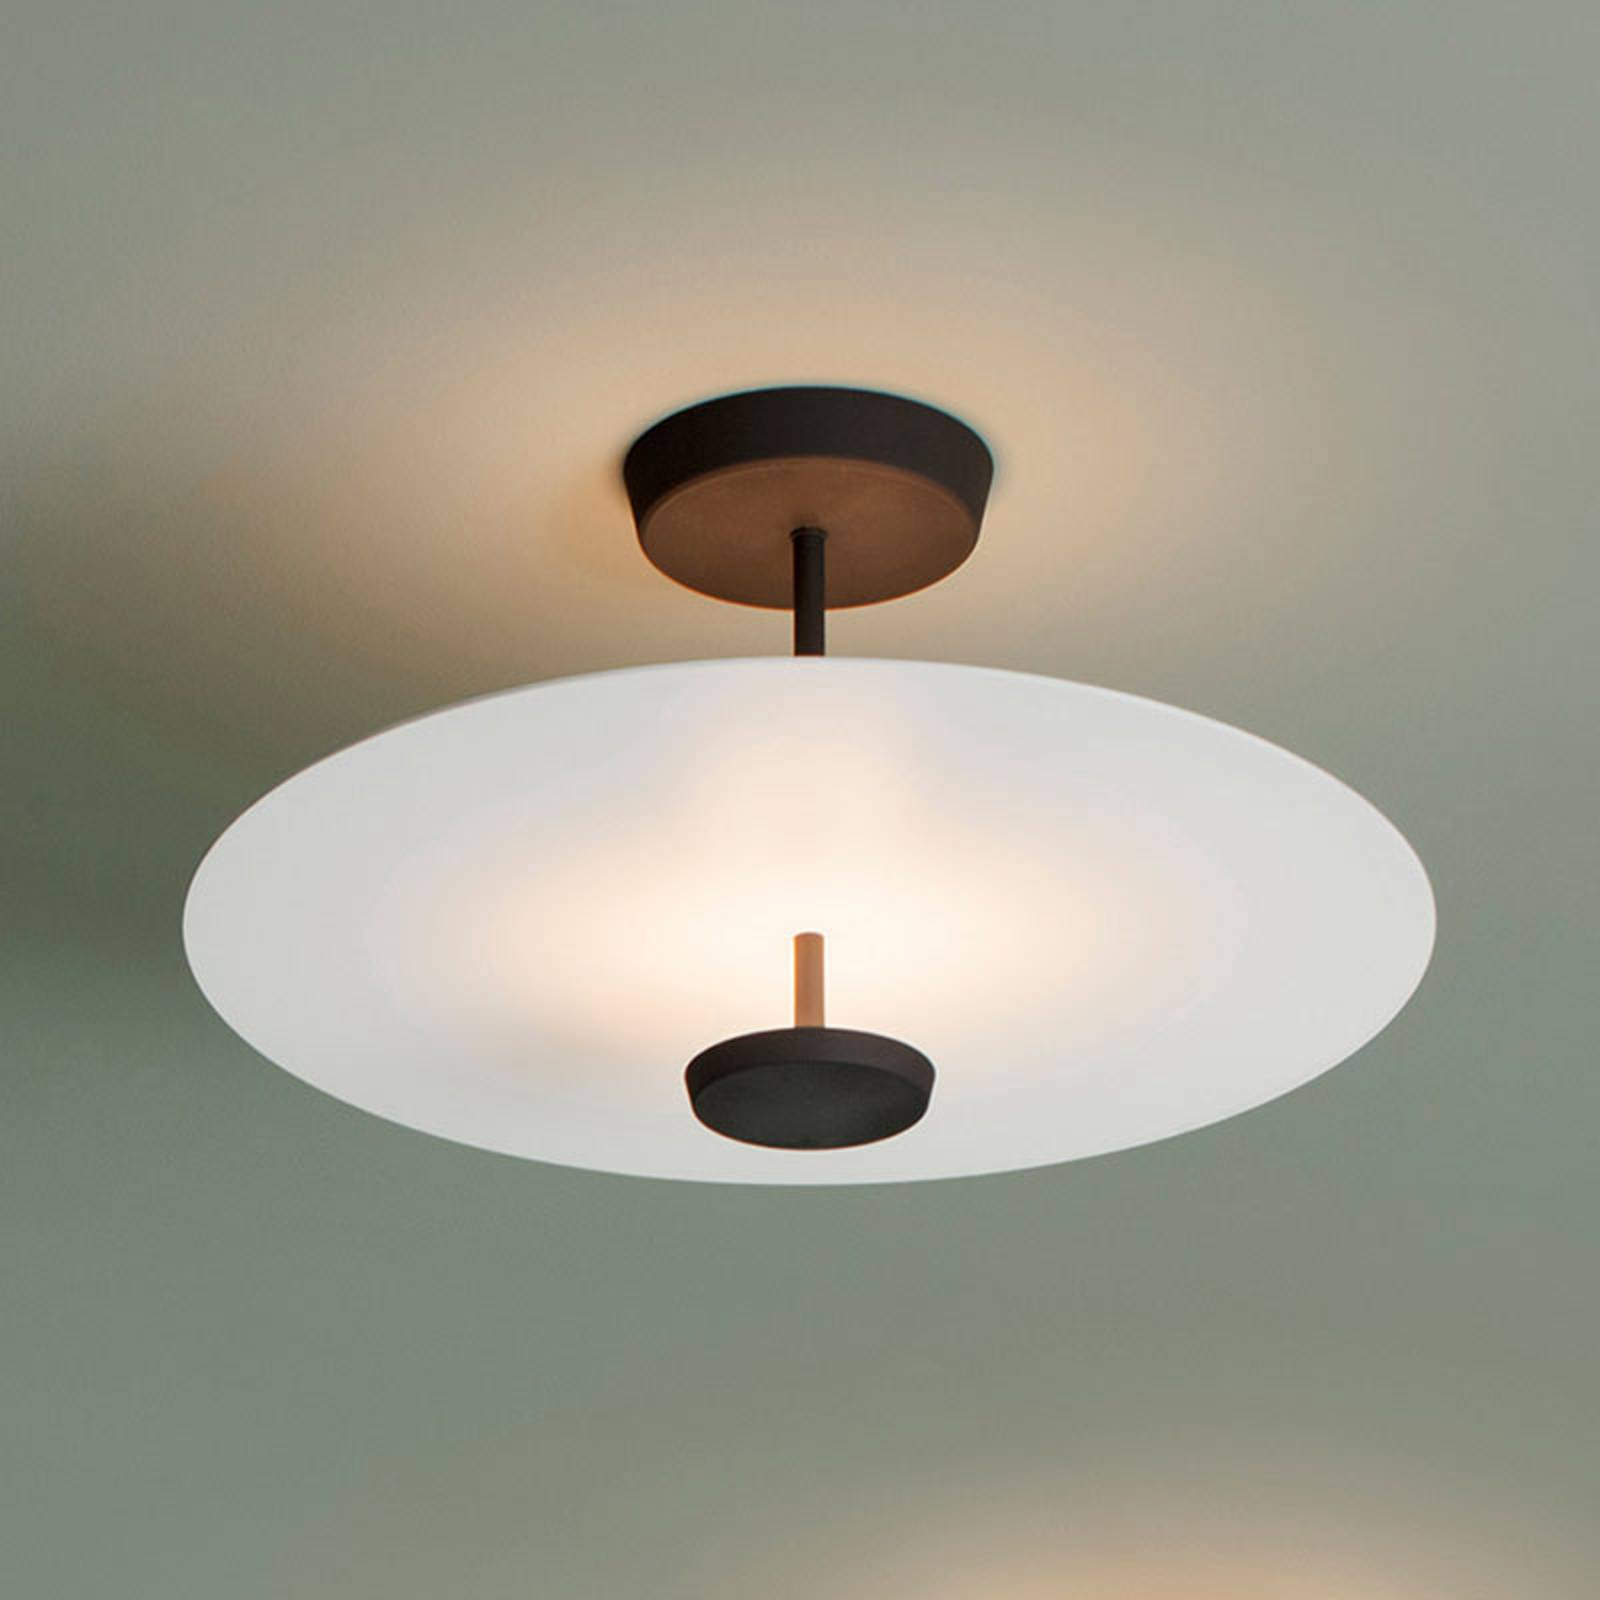 Vibia Flat LED-kattovalaisin 2-lamppuinen Ø 55 cm